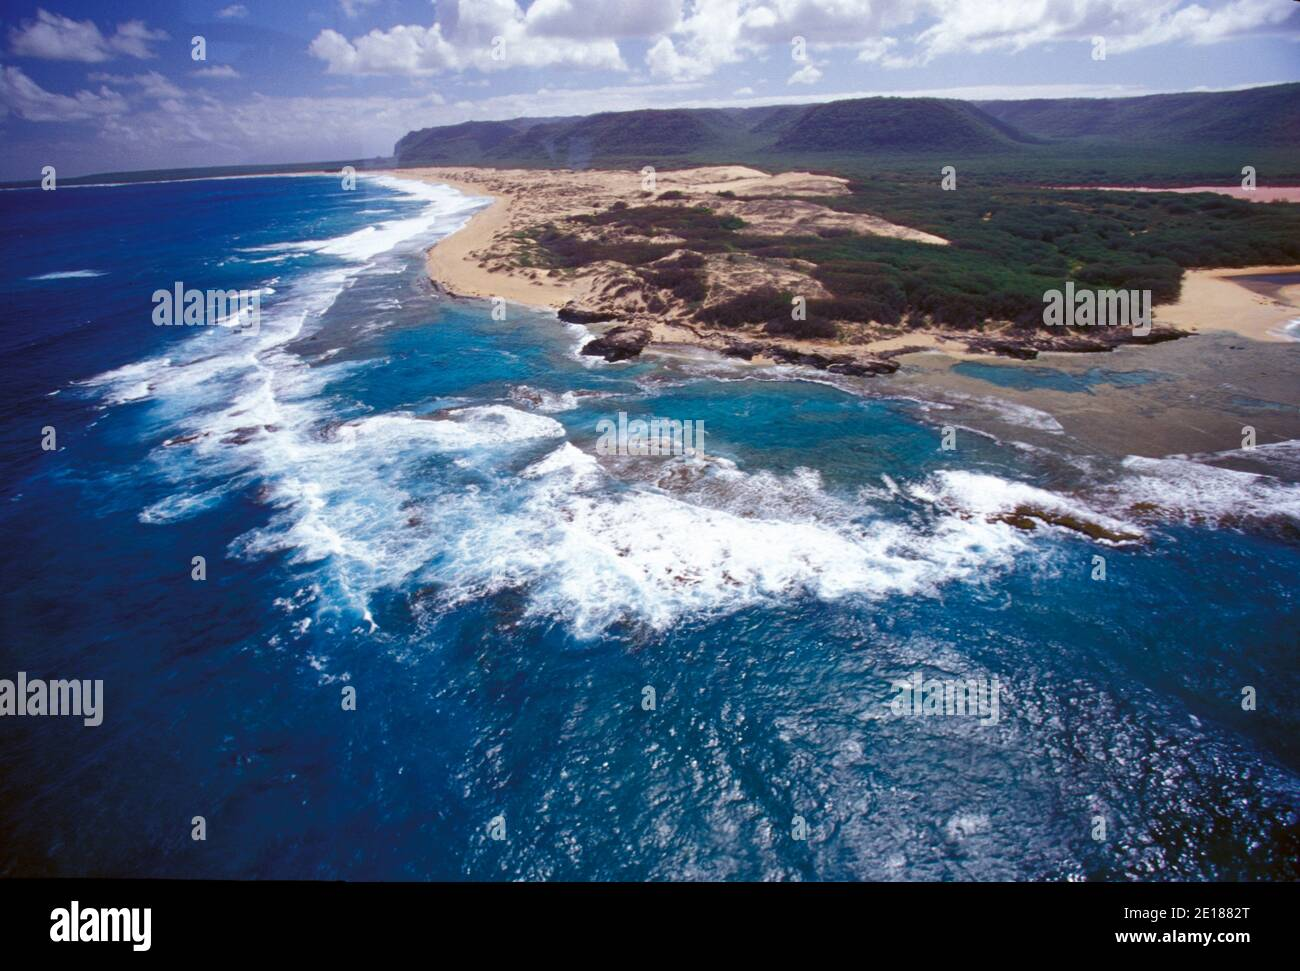 Niihau Coastline seen from the air. Pristine natural coastline, white sand beaches,  reefs, and clear blue water. Foto de stock